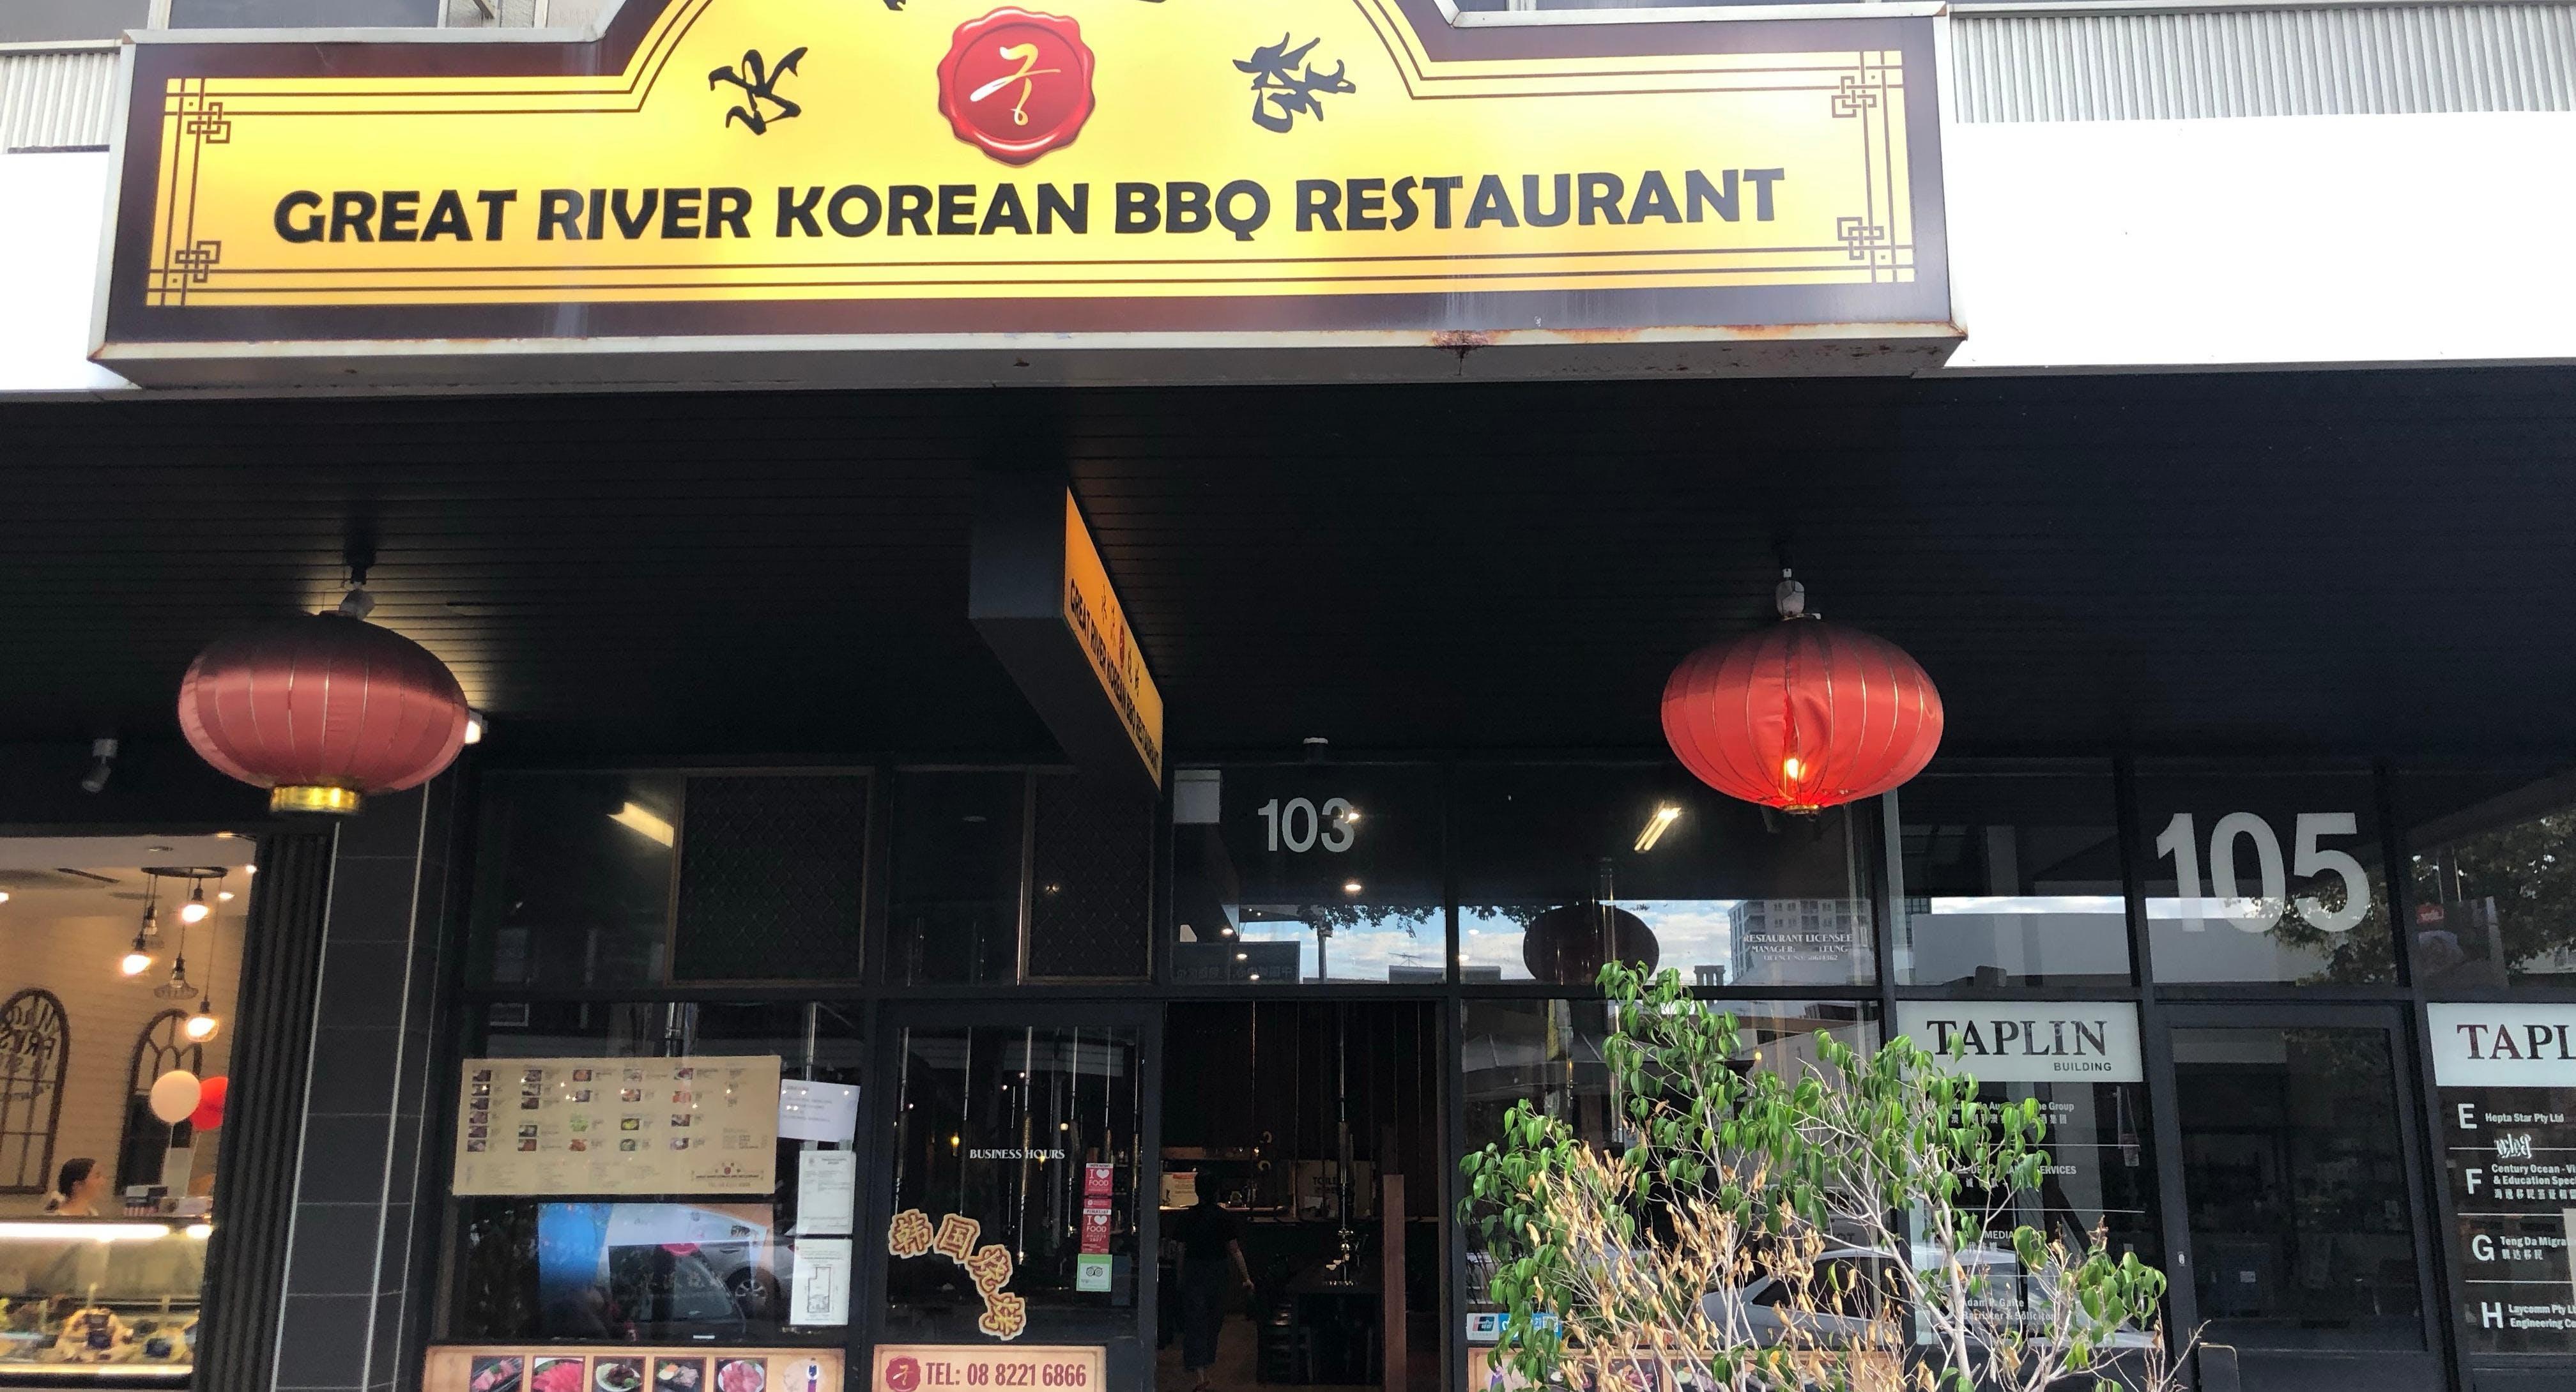 Great River Korean BBQ Restaurant